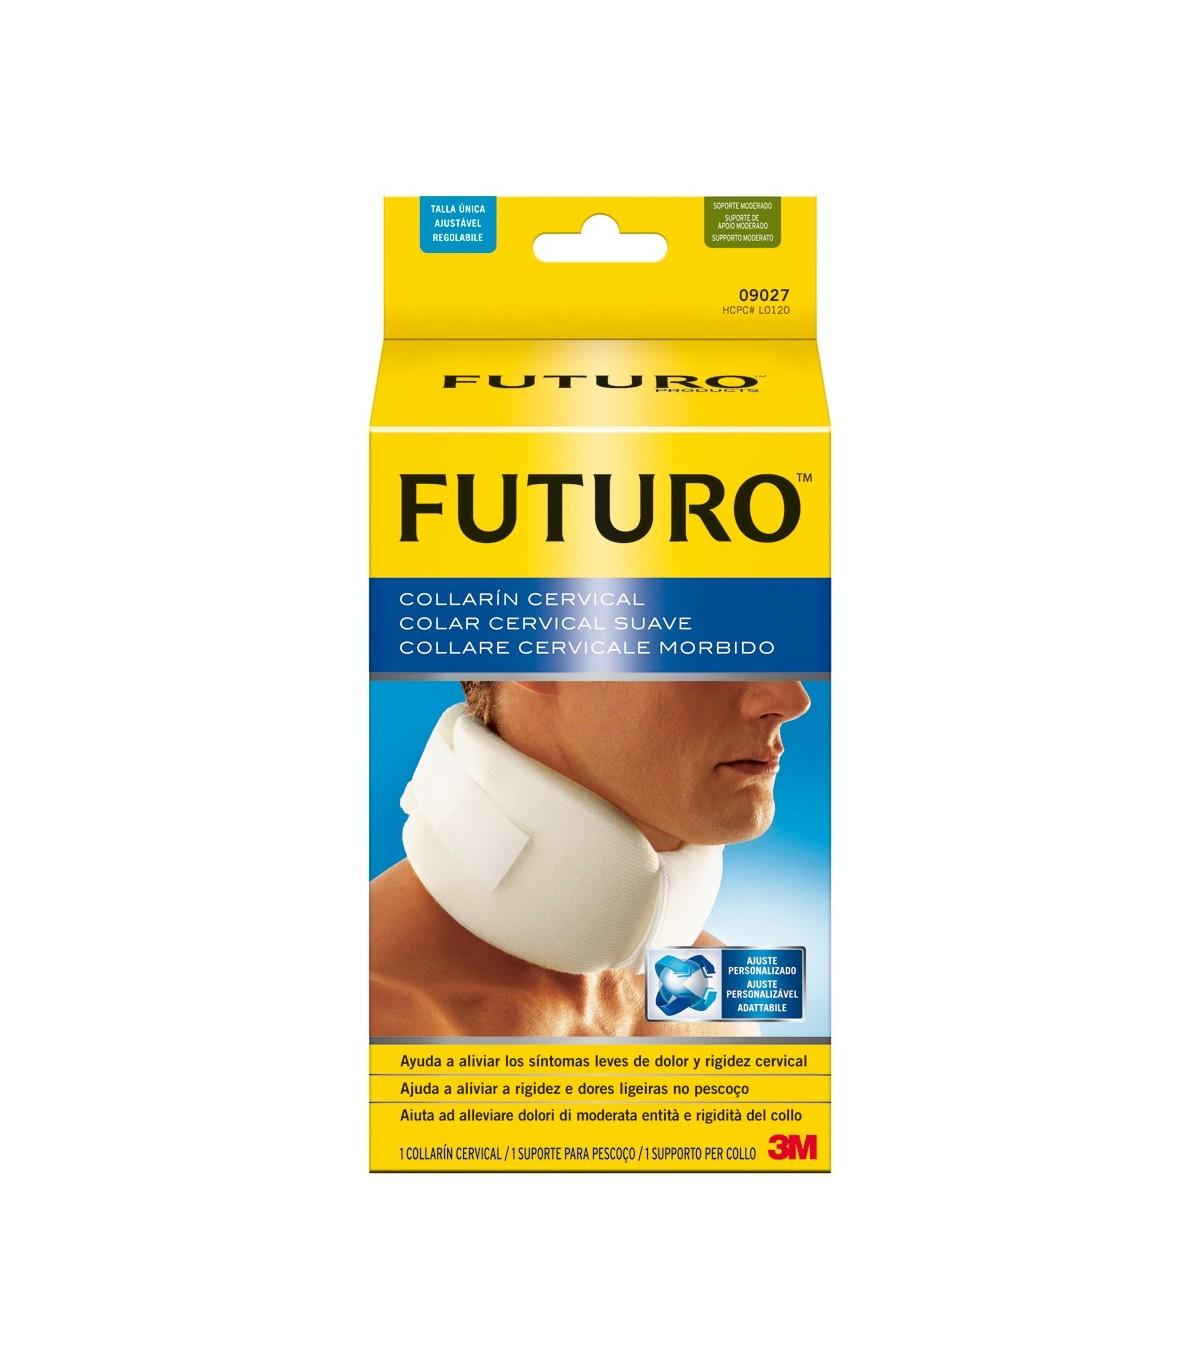 3M FUTURO COLLARIN CERVICAL AJUSTABLE